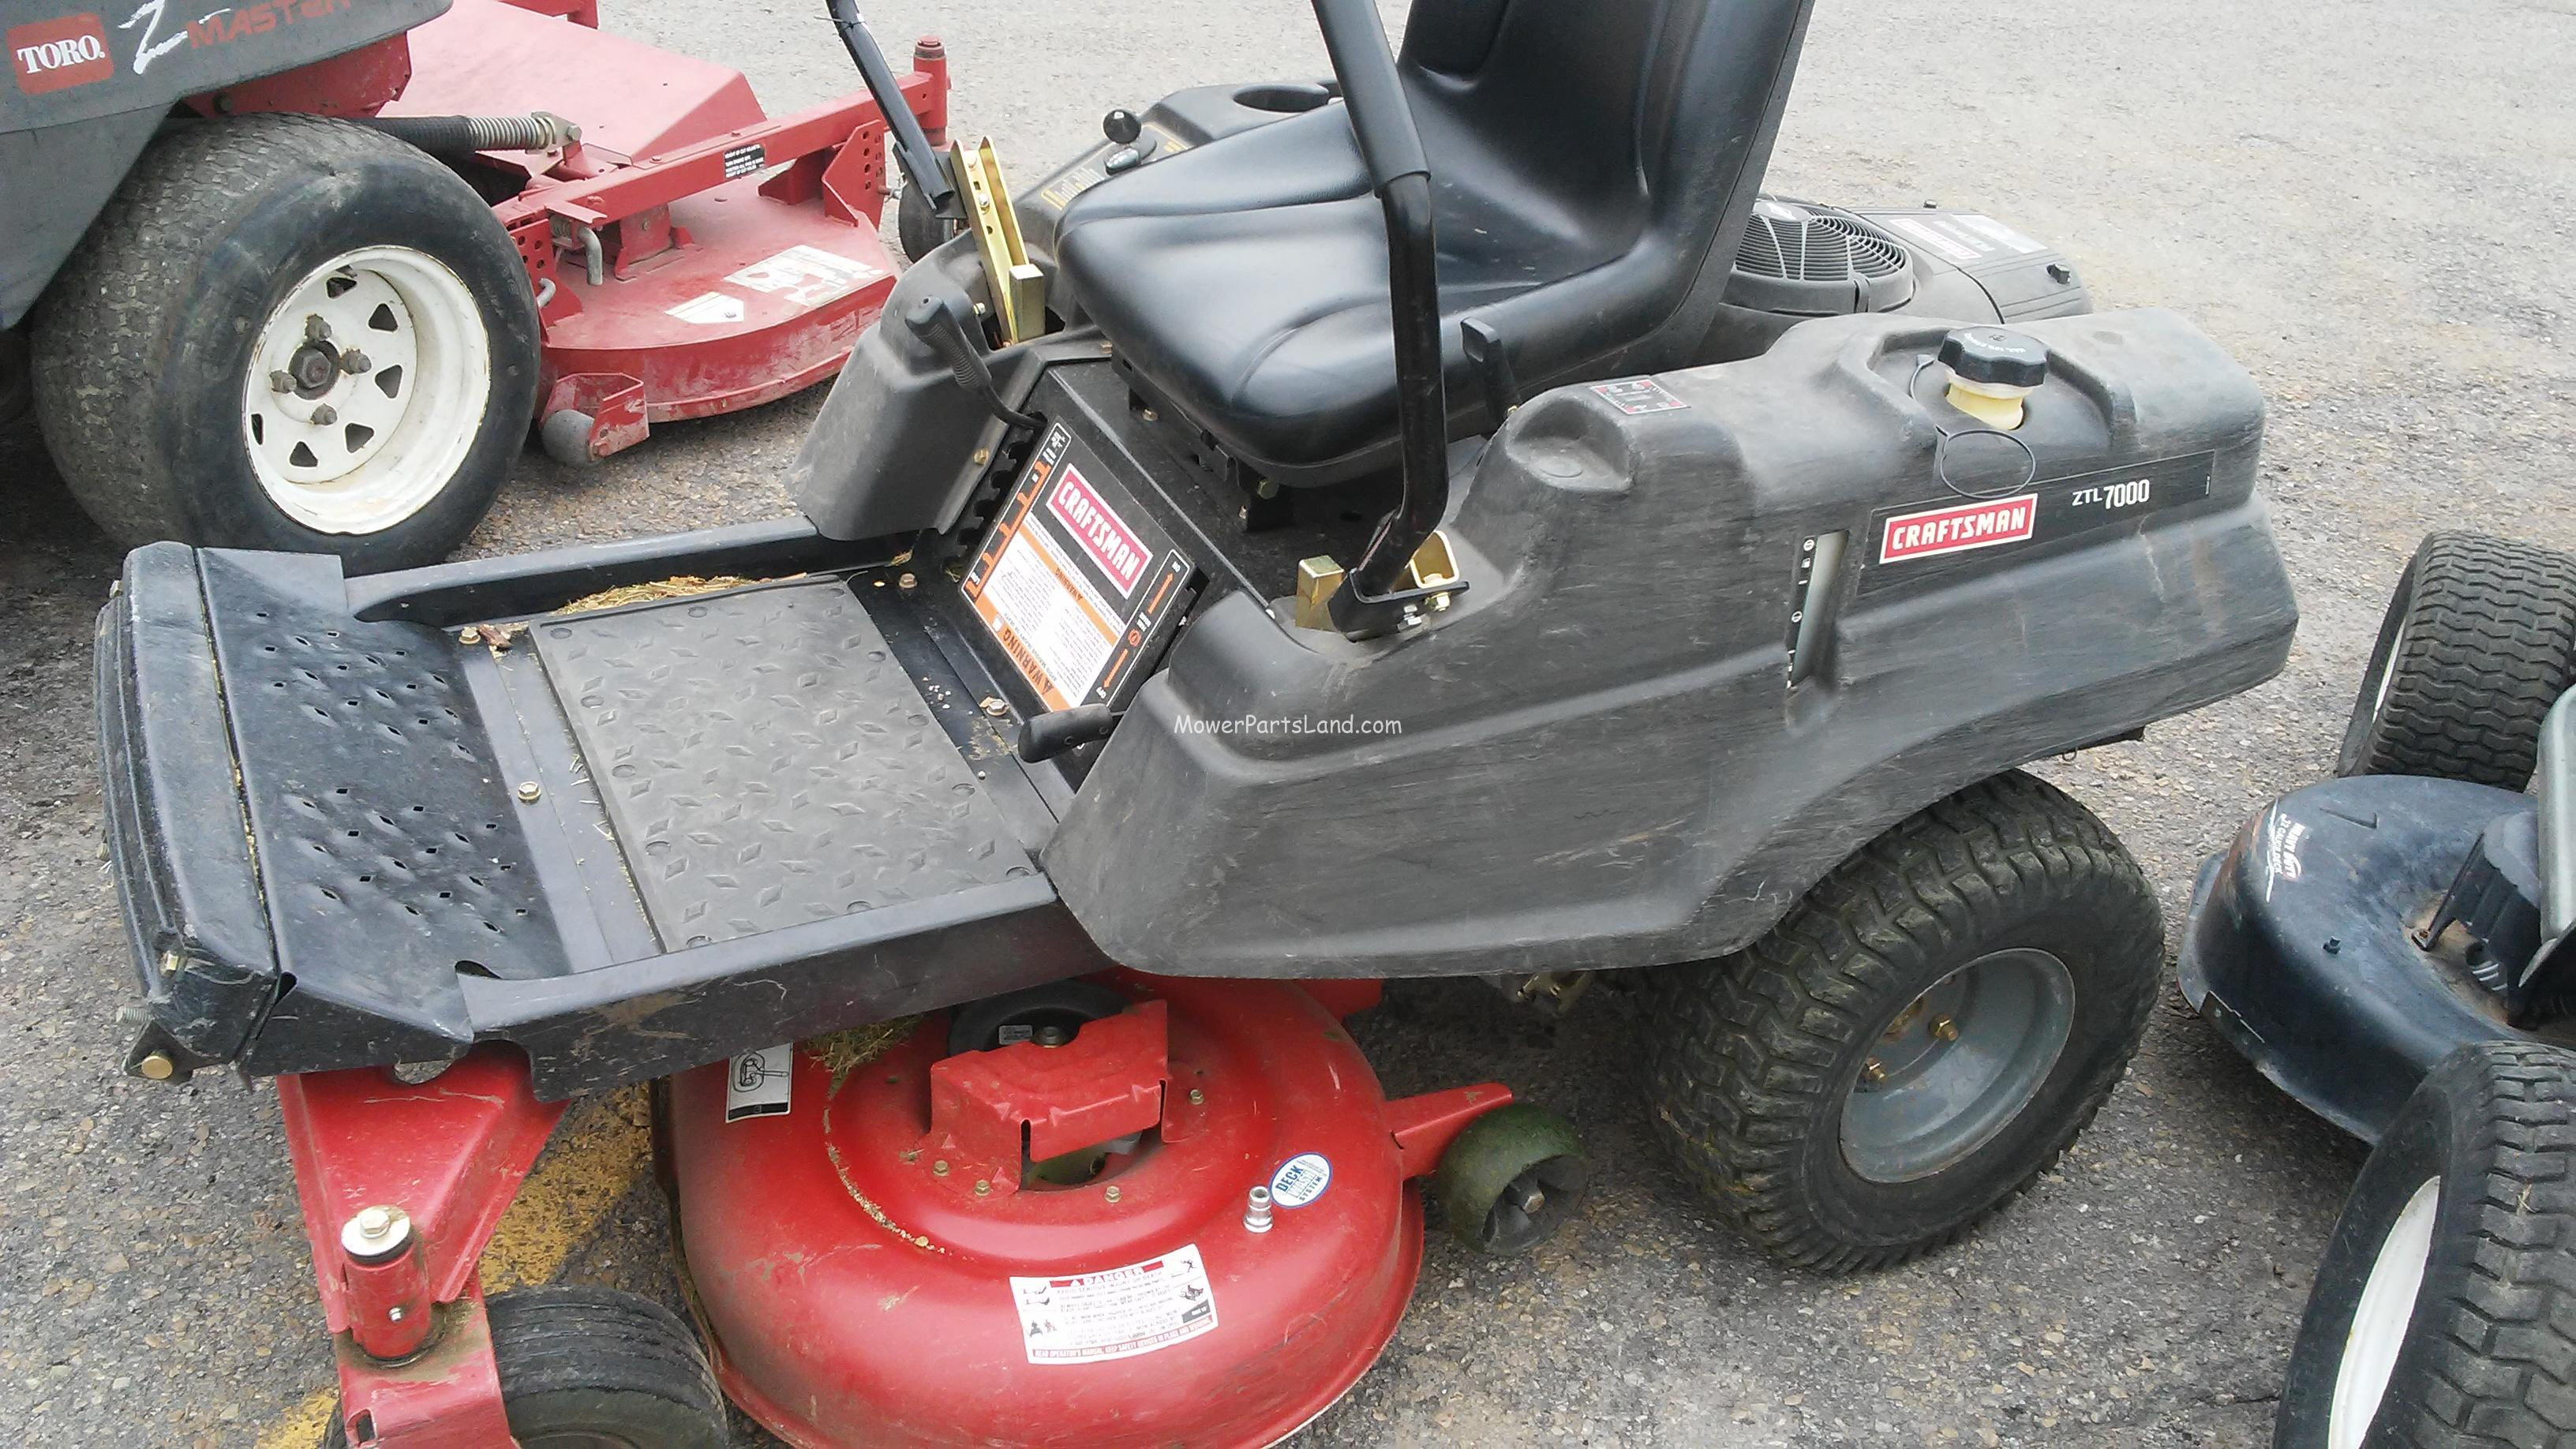 Replaces Craftsman Model 247 25001 Zero Turn Mower Carburetor